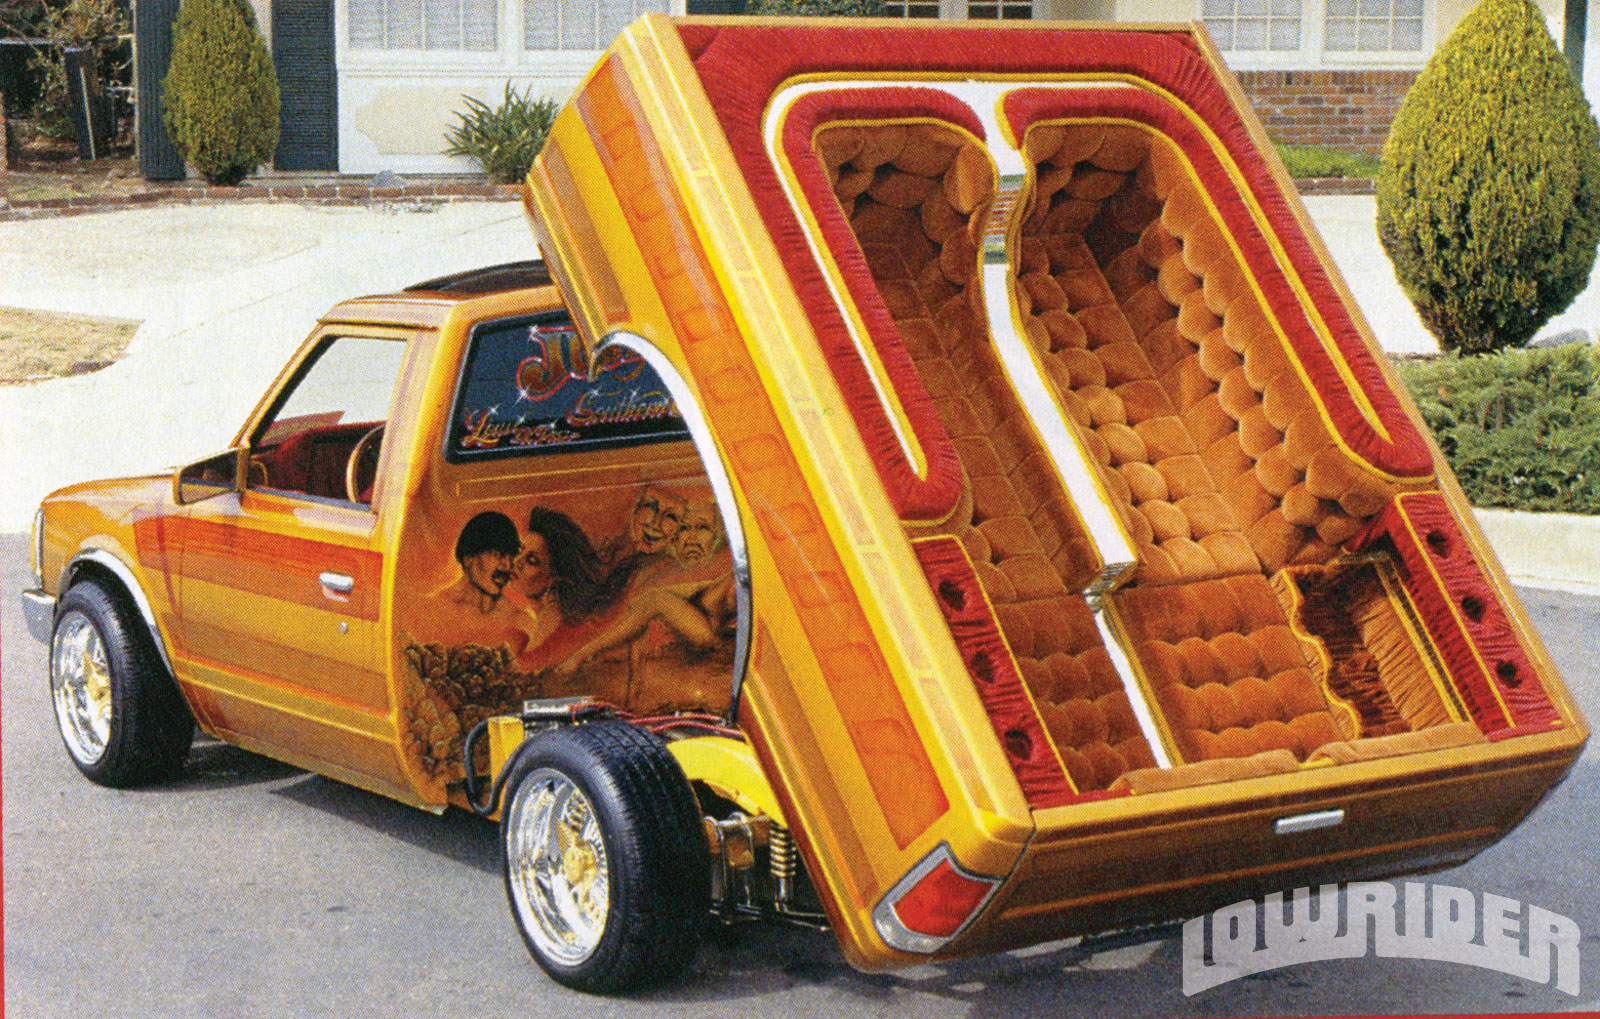 Lrmp O The Changing Lowrider Scene Custom Lowrider Truck on 02 Cavalier Custom